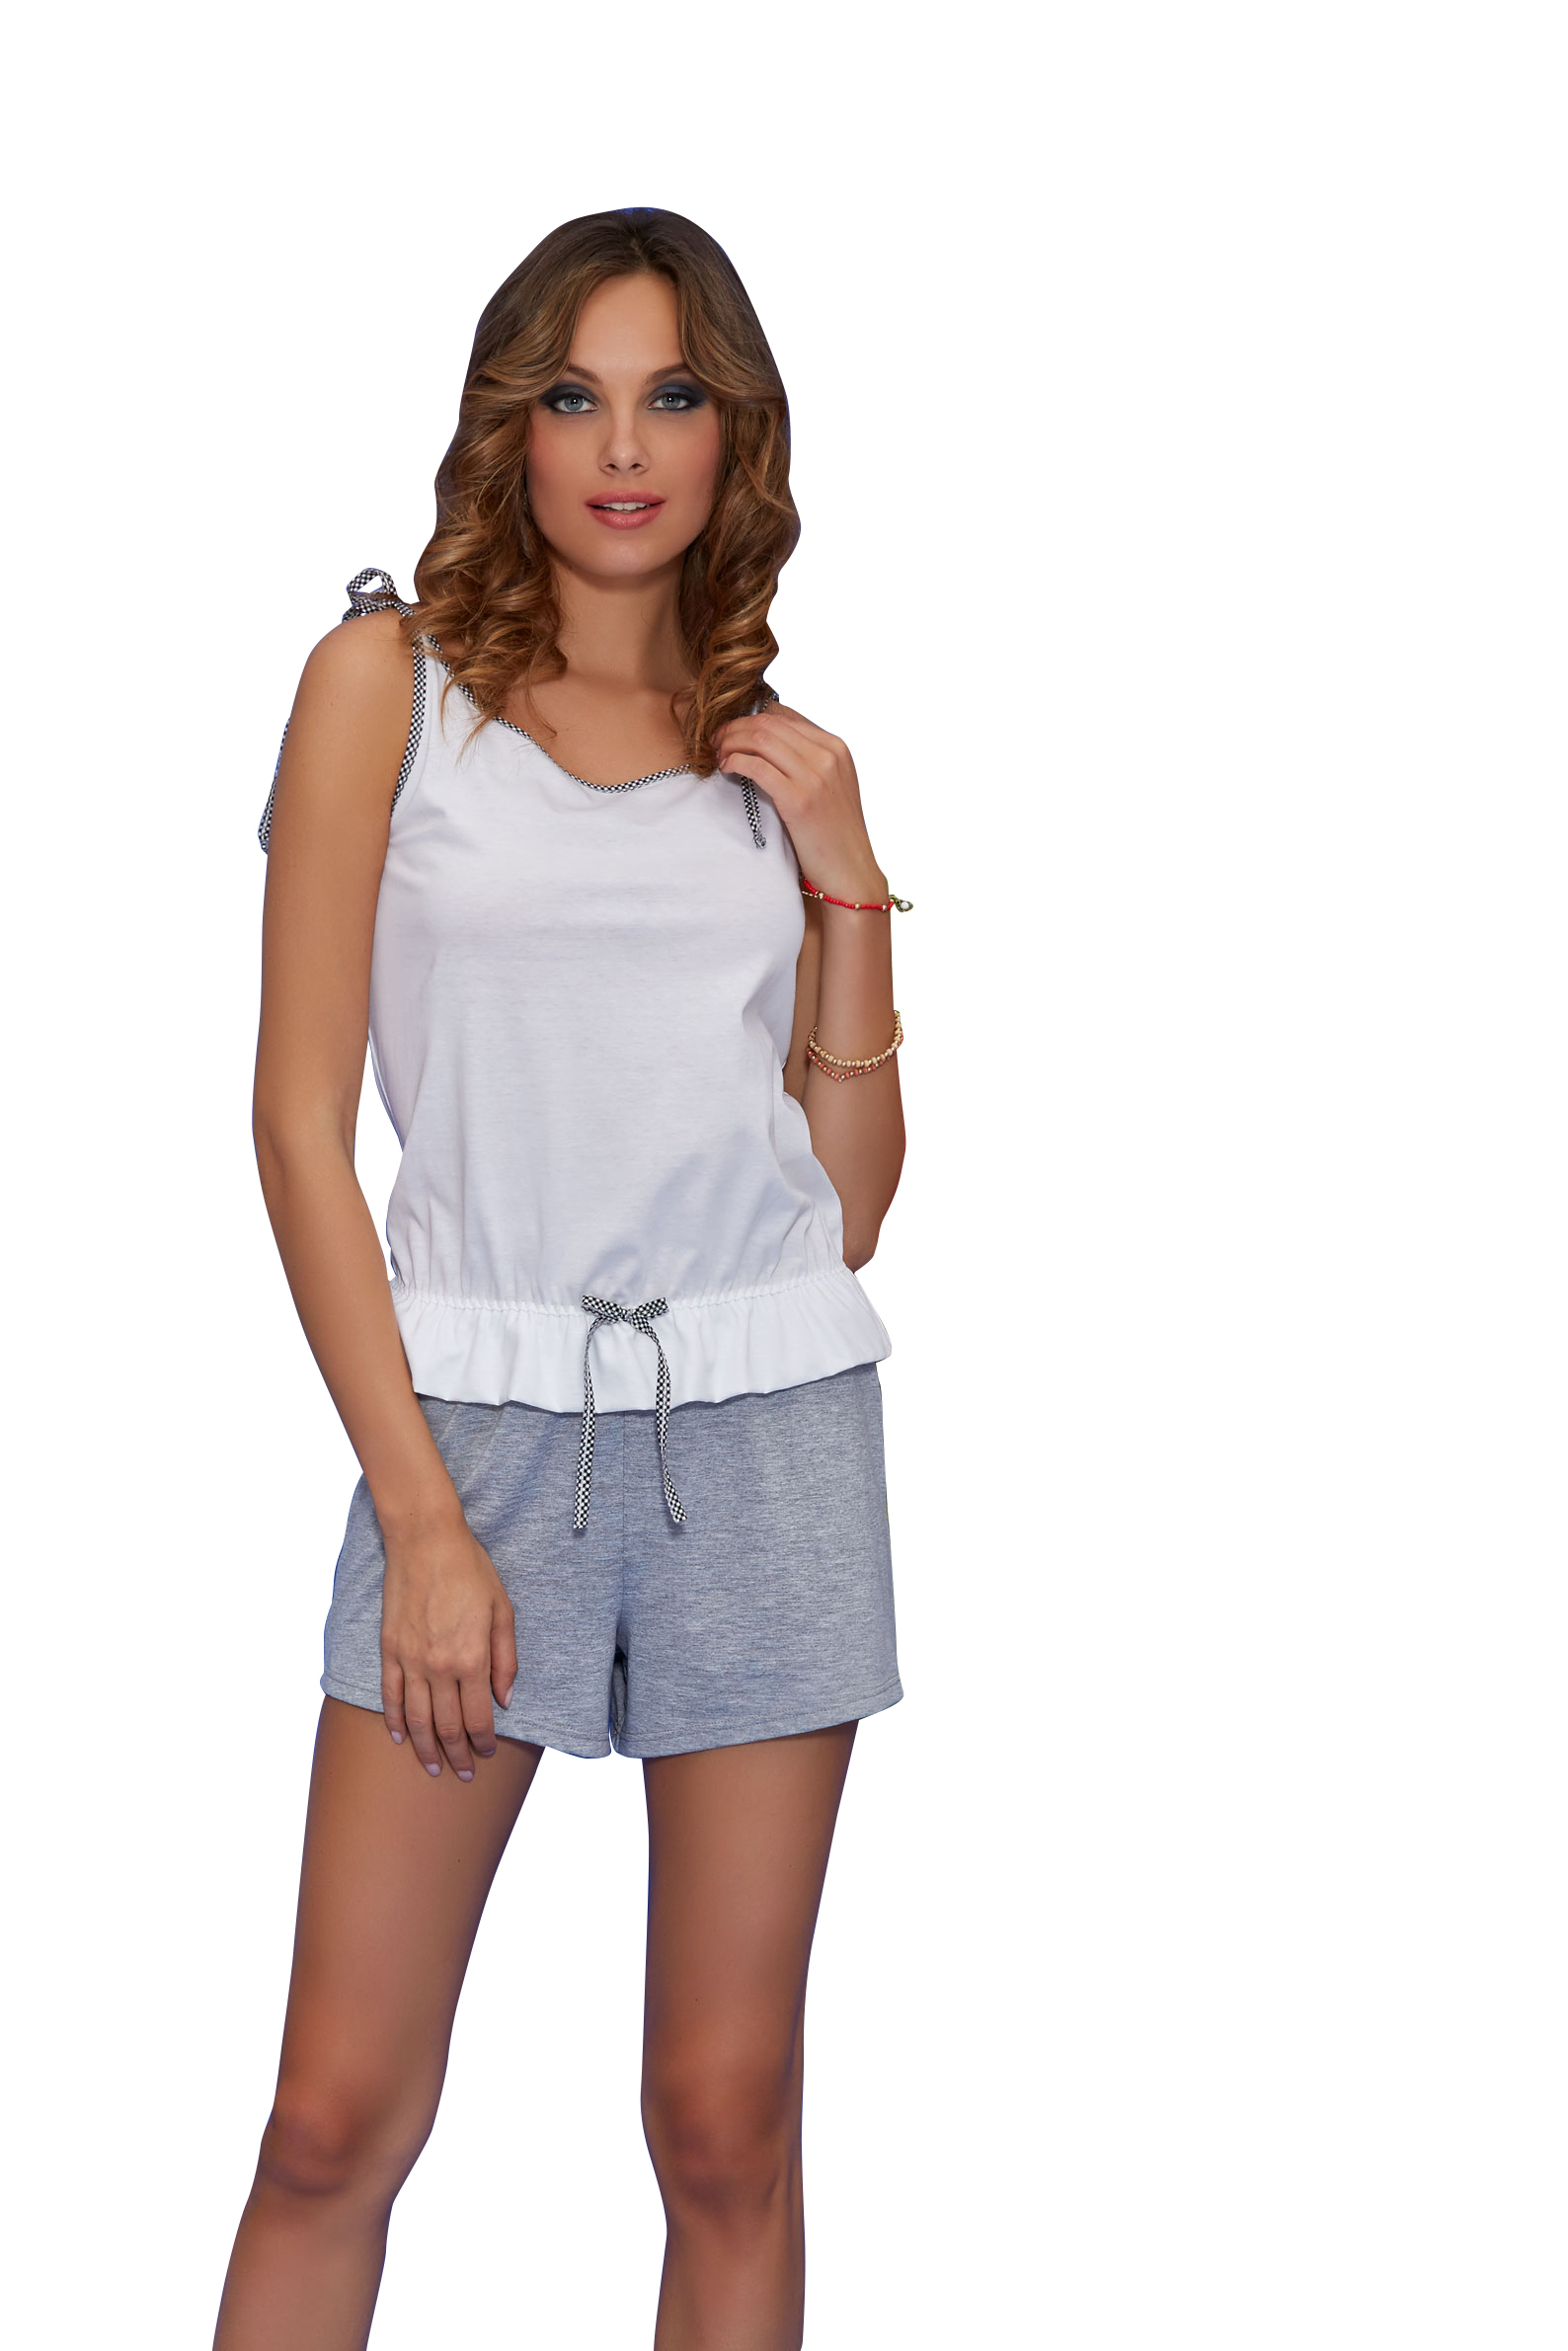 0ce265aec29 Γυναικεία καλοκαιρινή πυτζάμα φόρμα σορτς made in Italy μόνο στο BUSTO